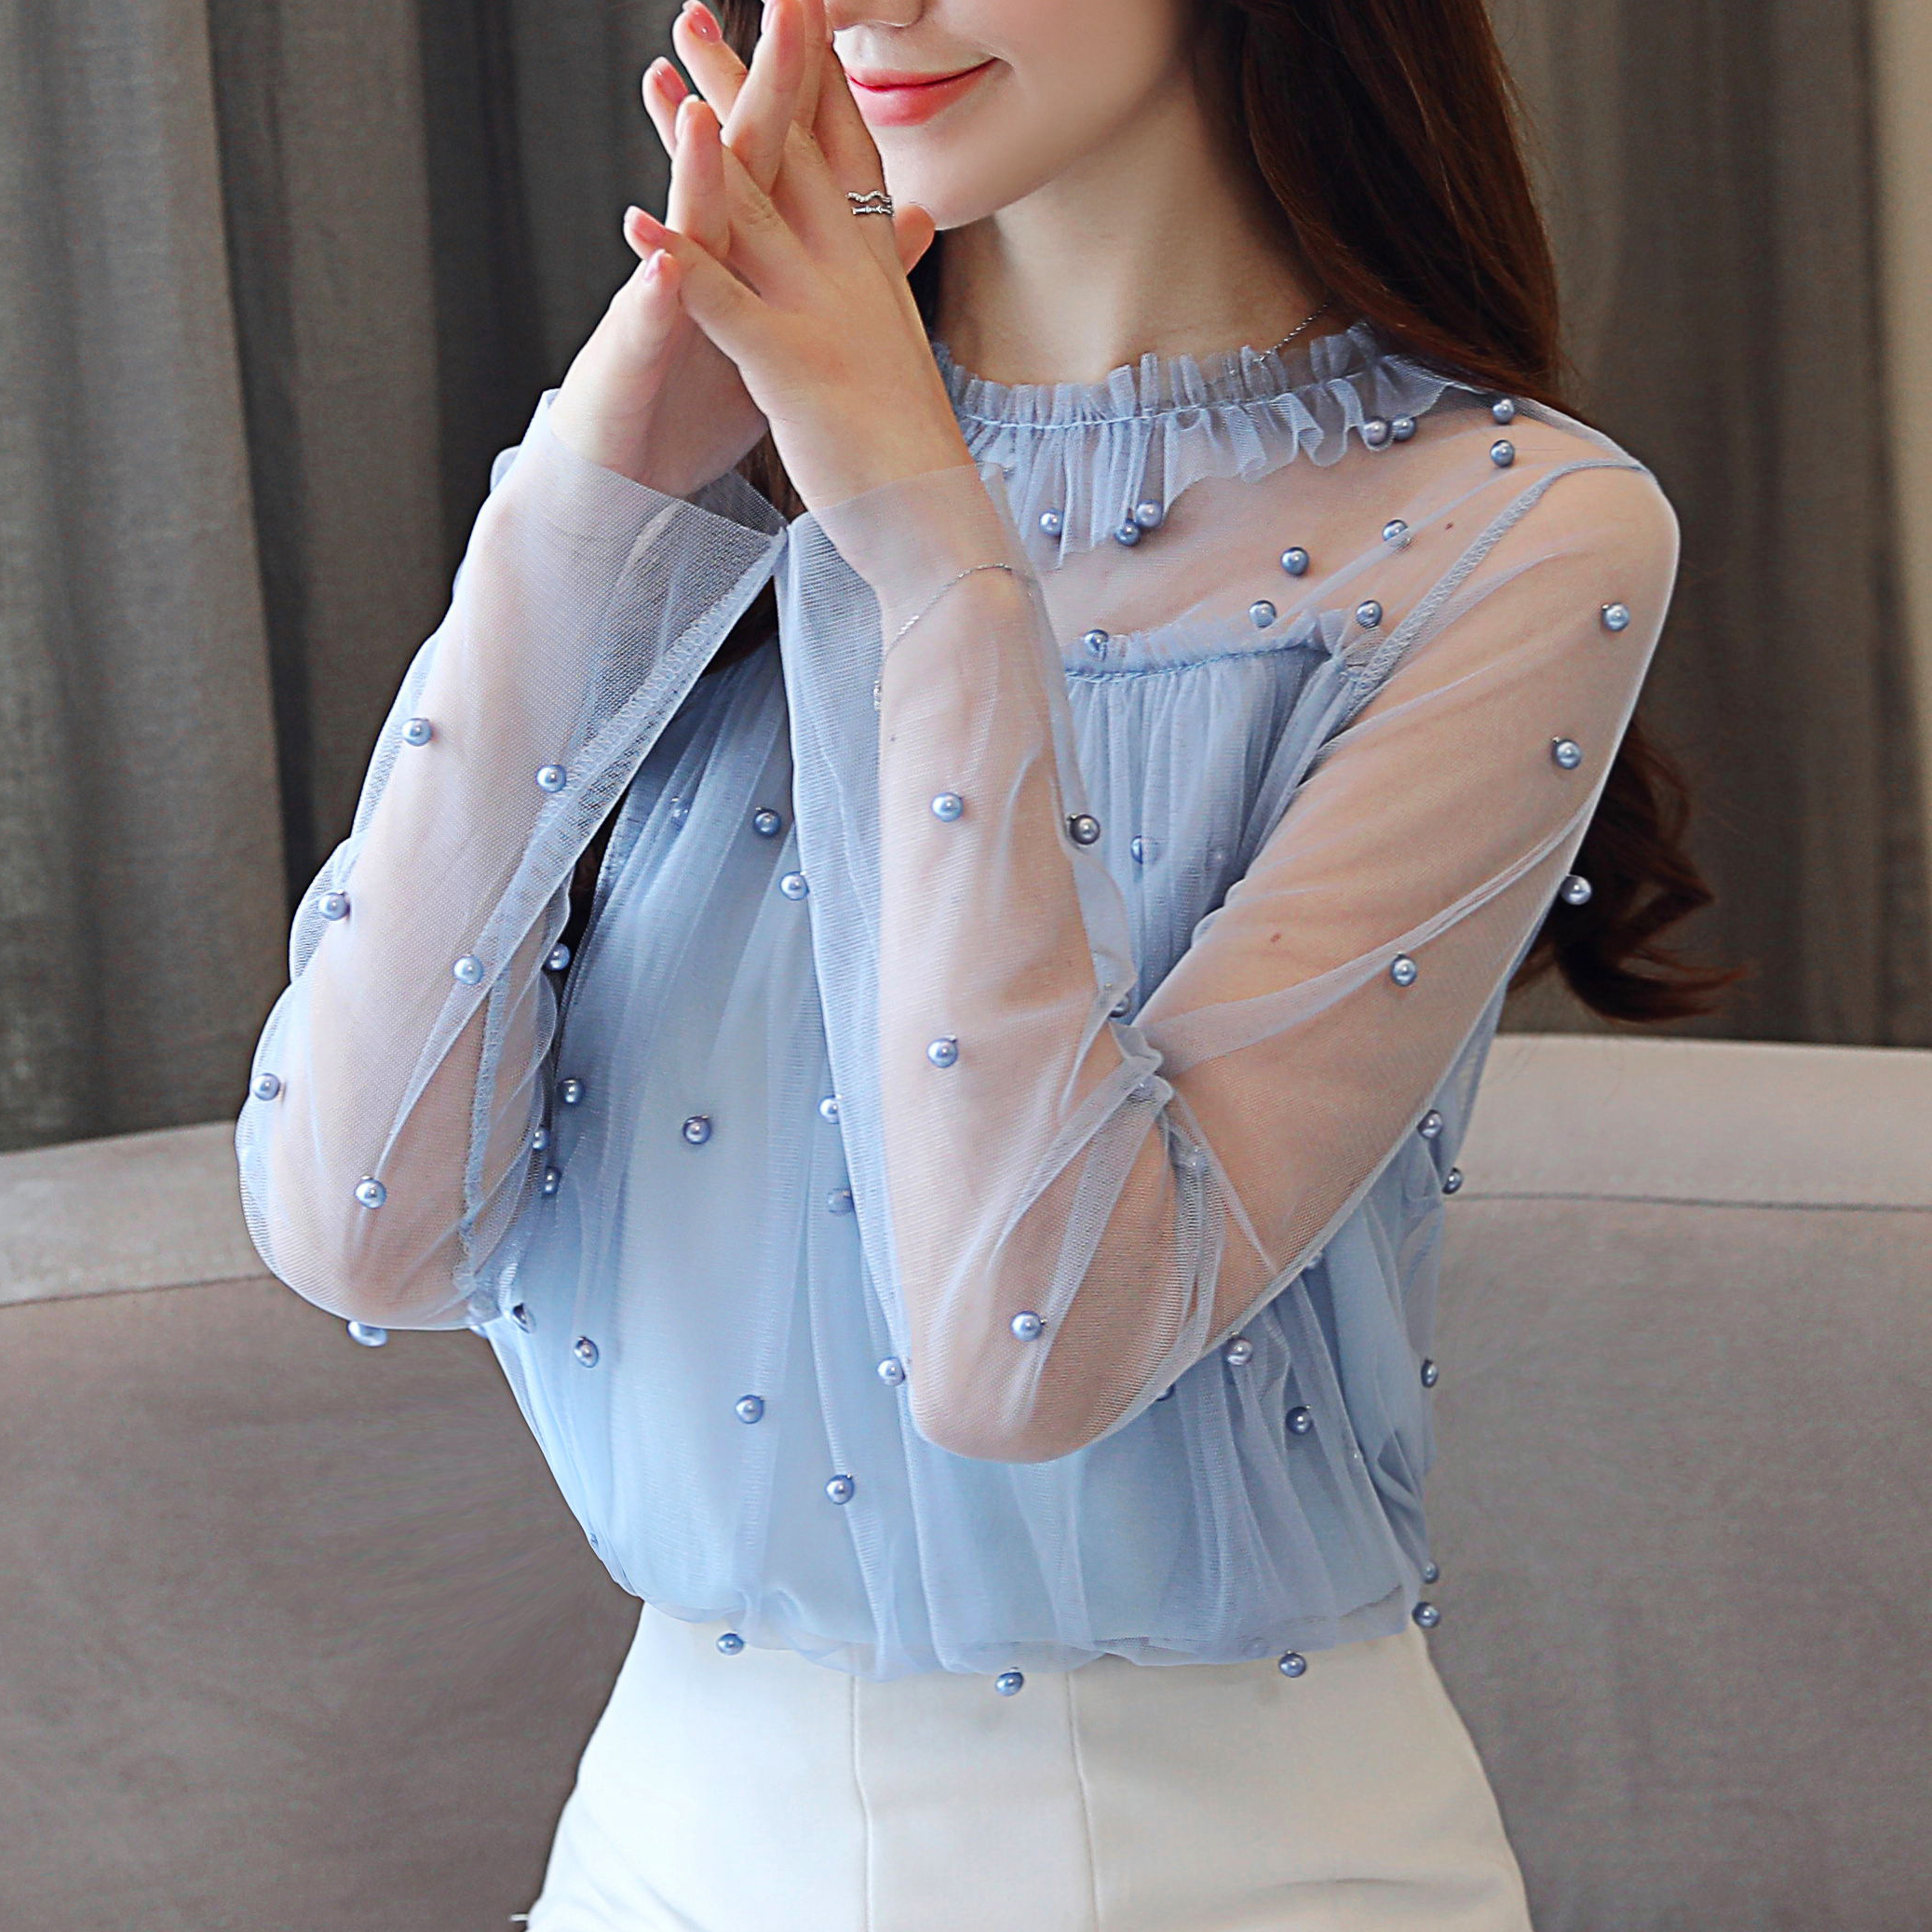 Encaje Tops Nuevo Sexy Otoño Larga rosado La 30 Blusas Gasa Camisas Azul Mujeres Dulce Elegante De Moda 0863 Blusa 2018 Manga Mujer dqw5XZw